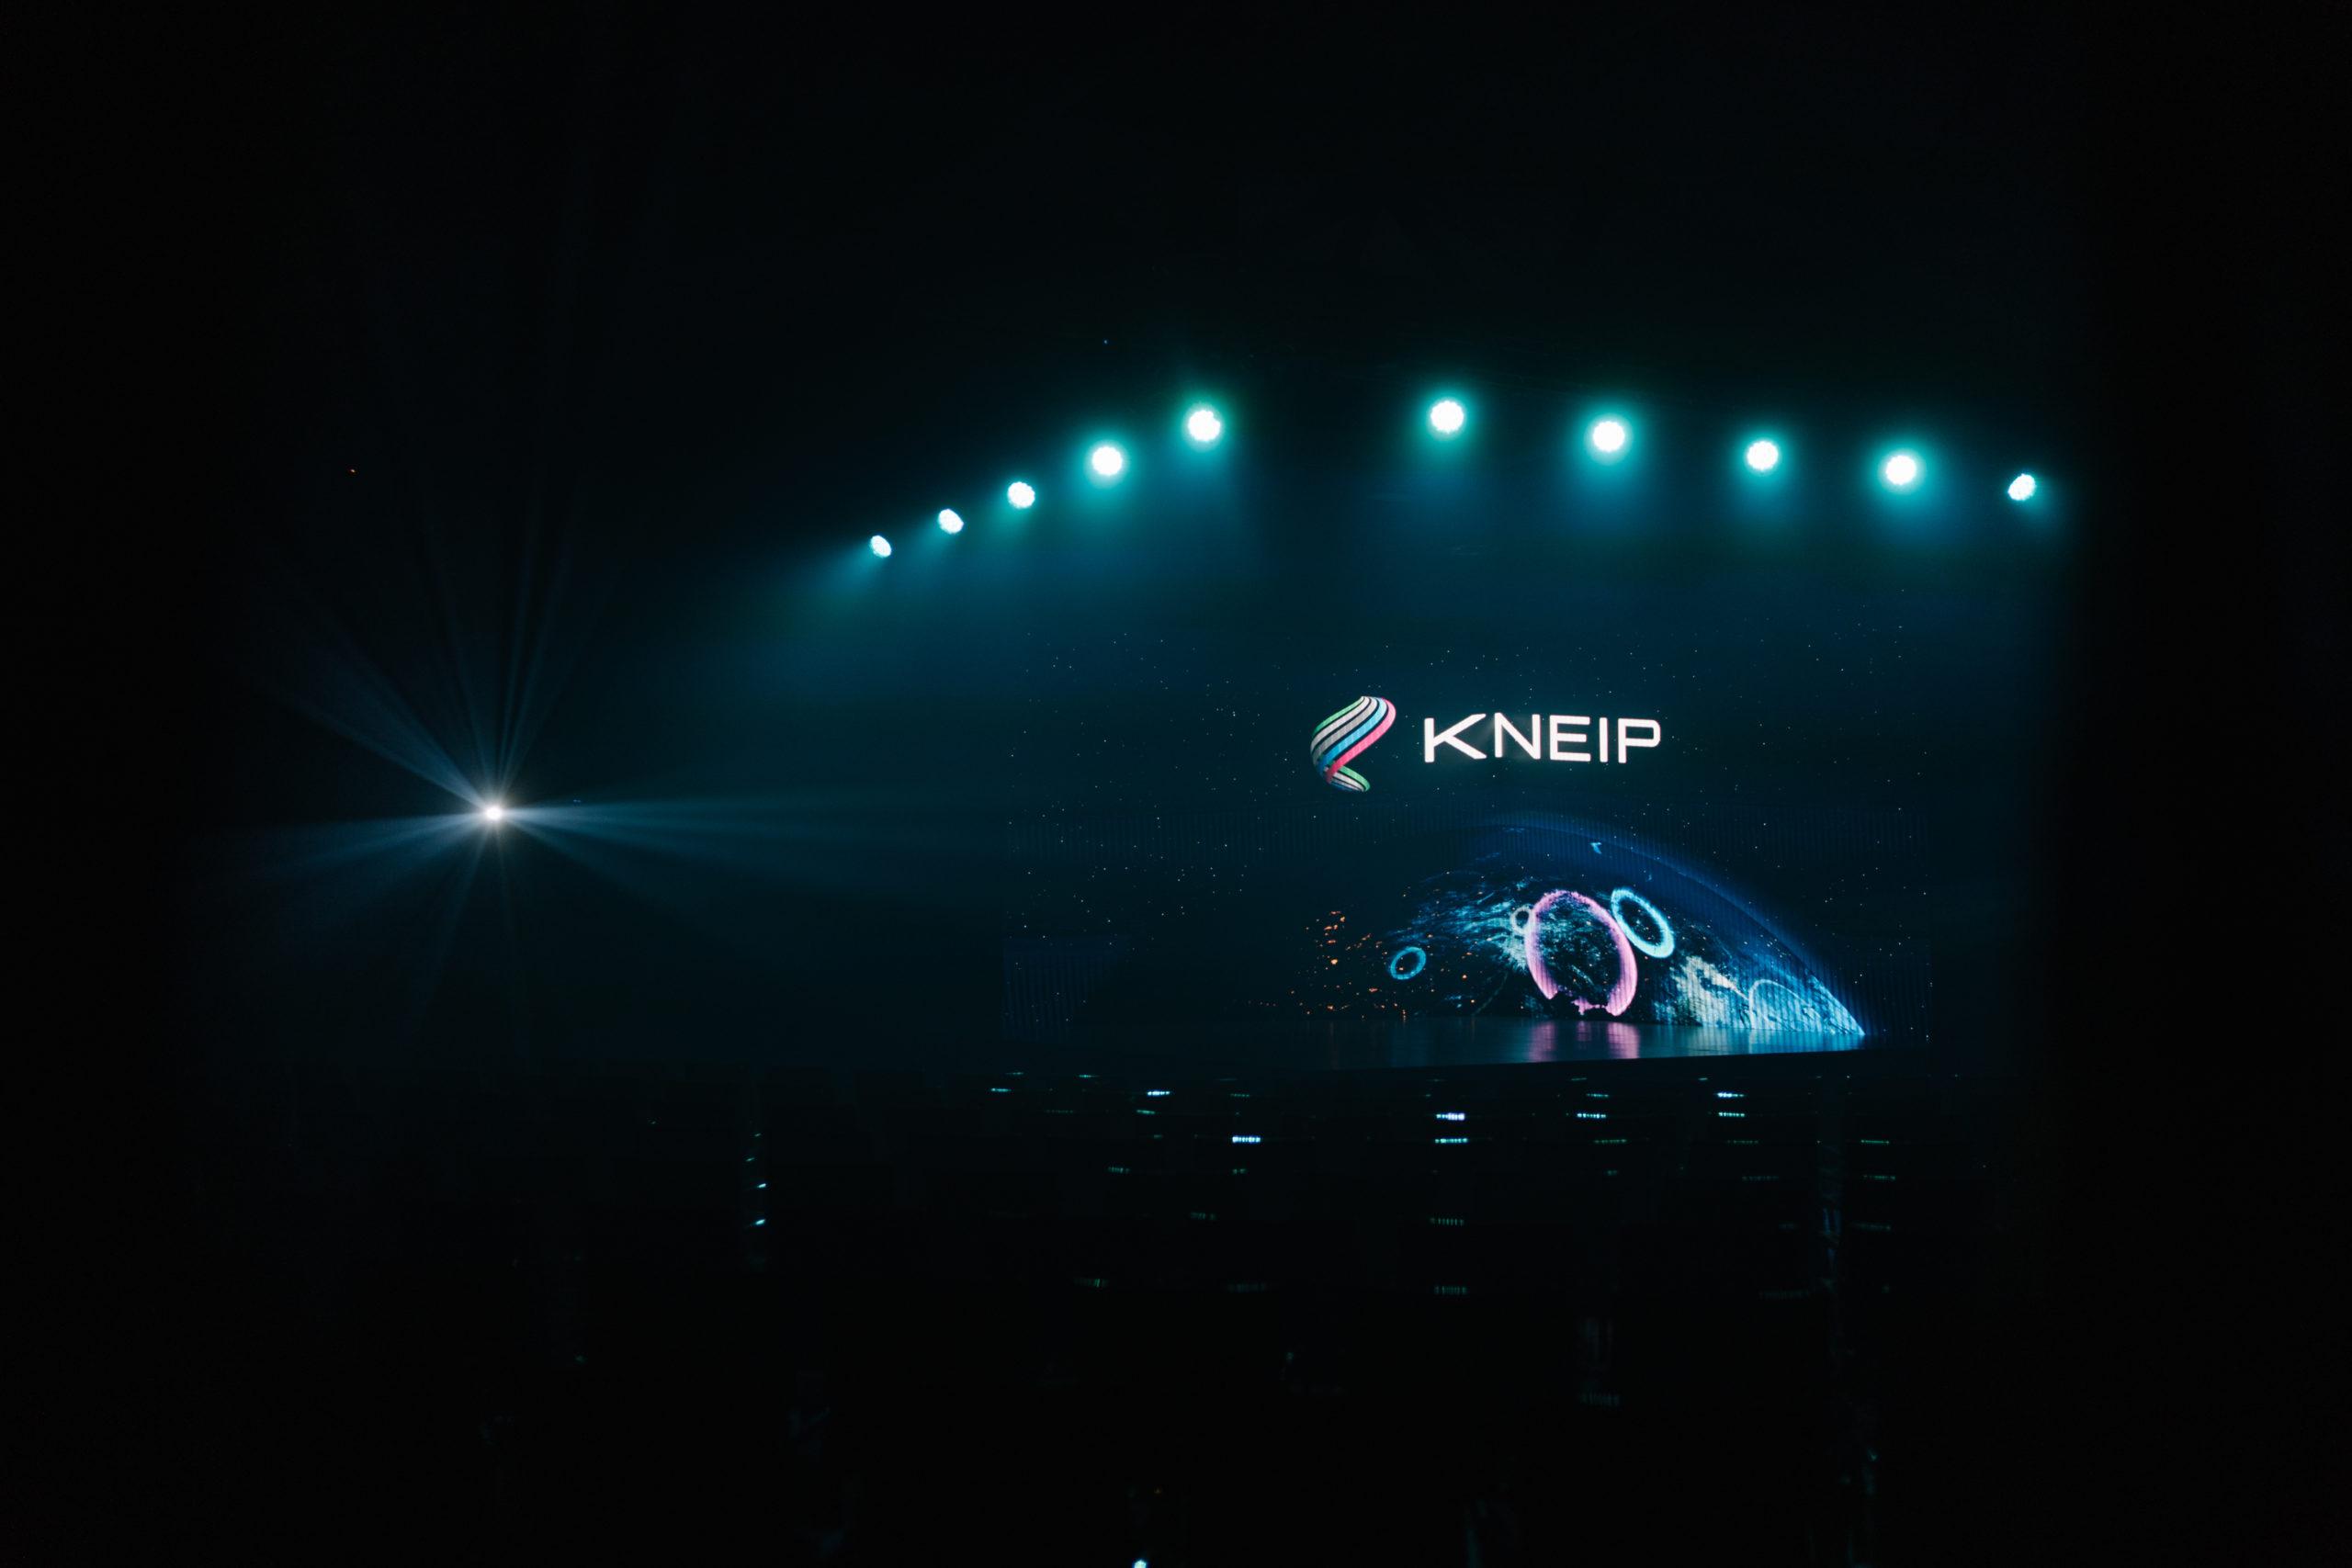 Launch of a digital platform